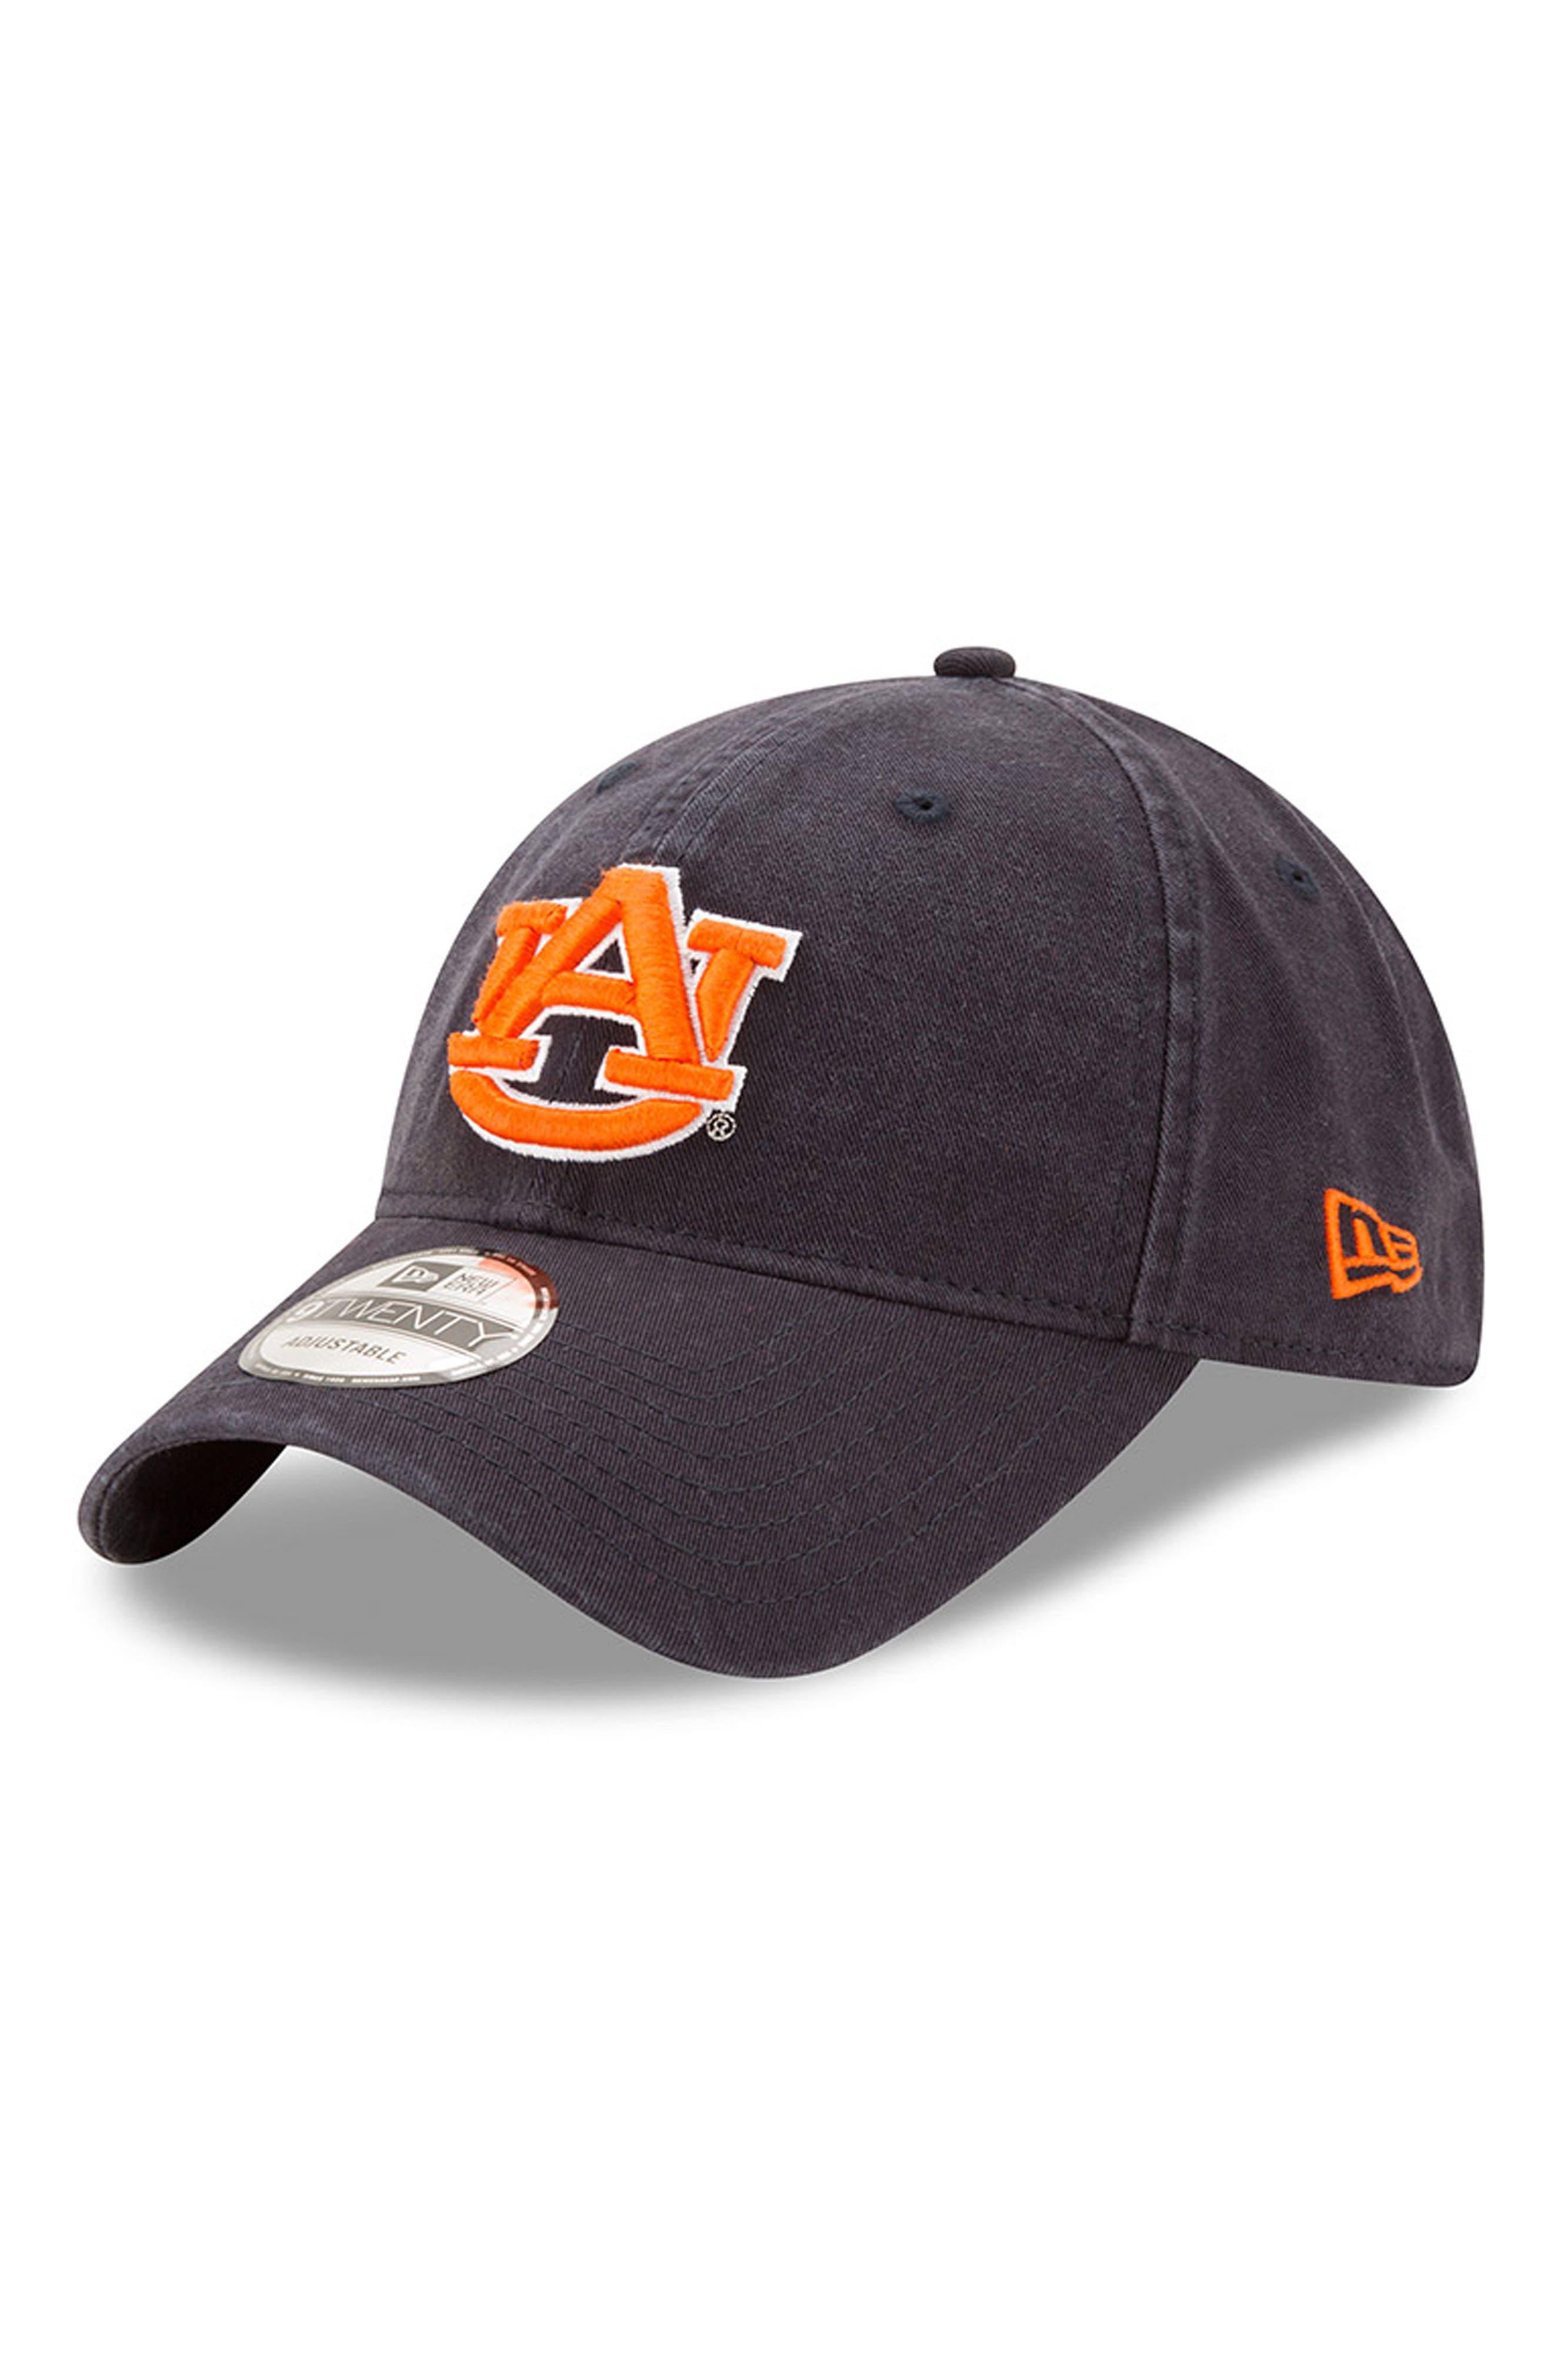 New Era Collegiate Core Classic - Auburn Tigers Baseball Cap,                         Main,                         color, Auburn Tigers